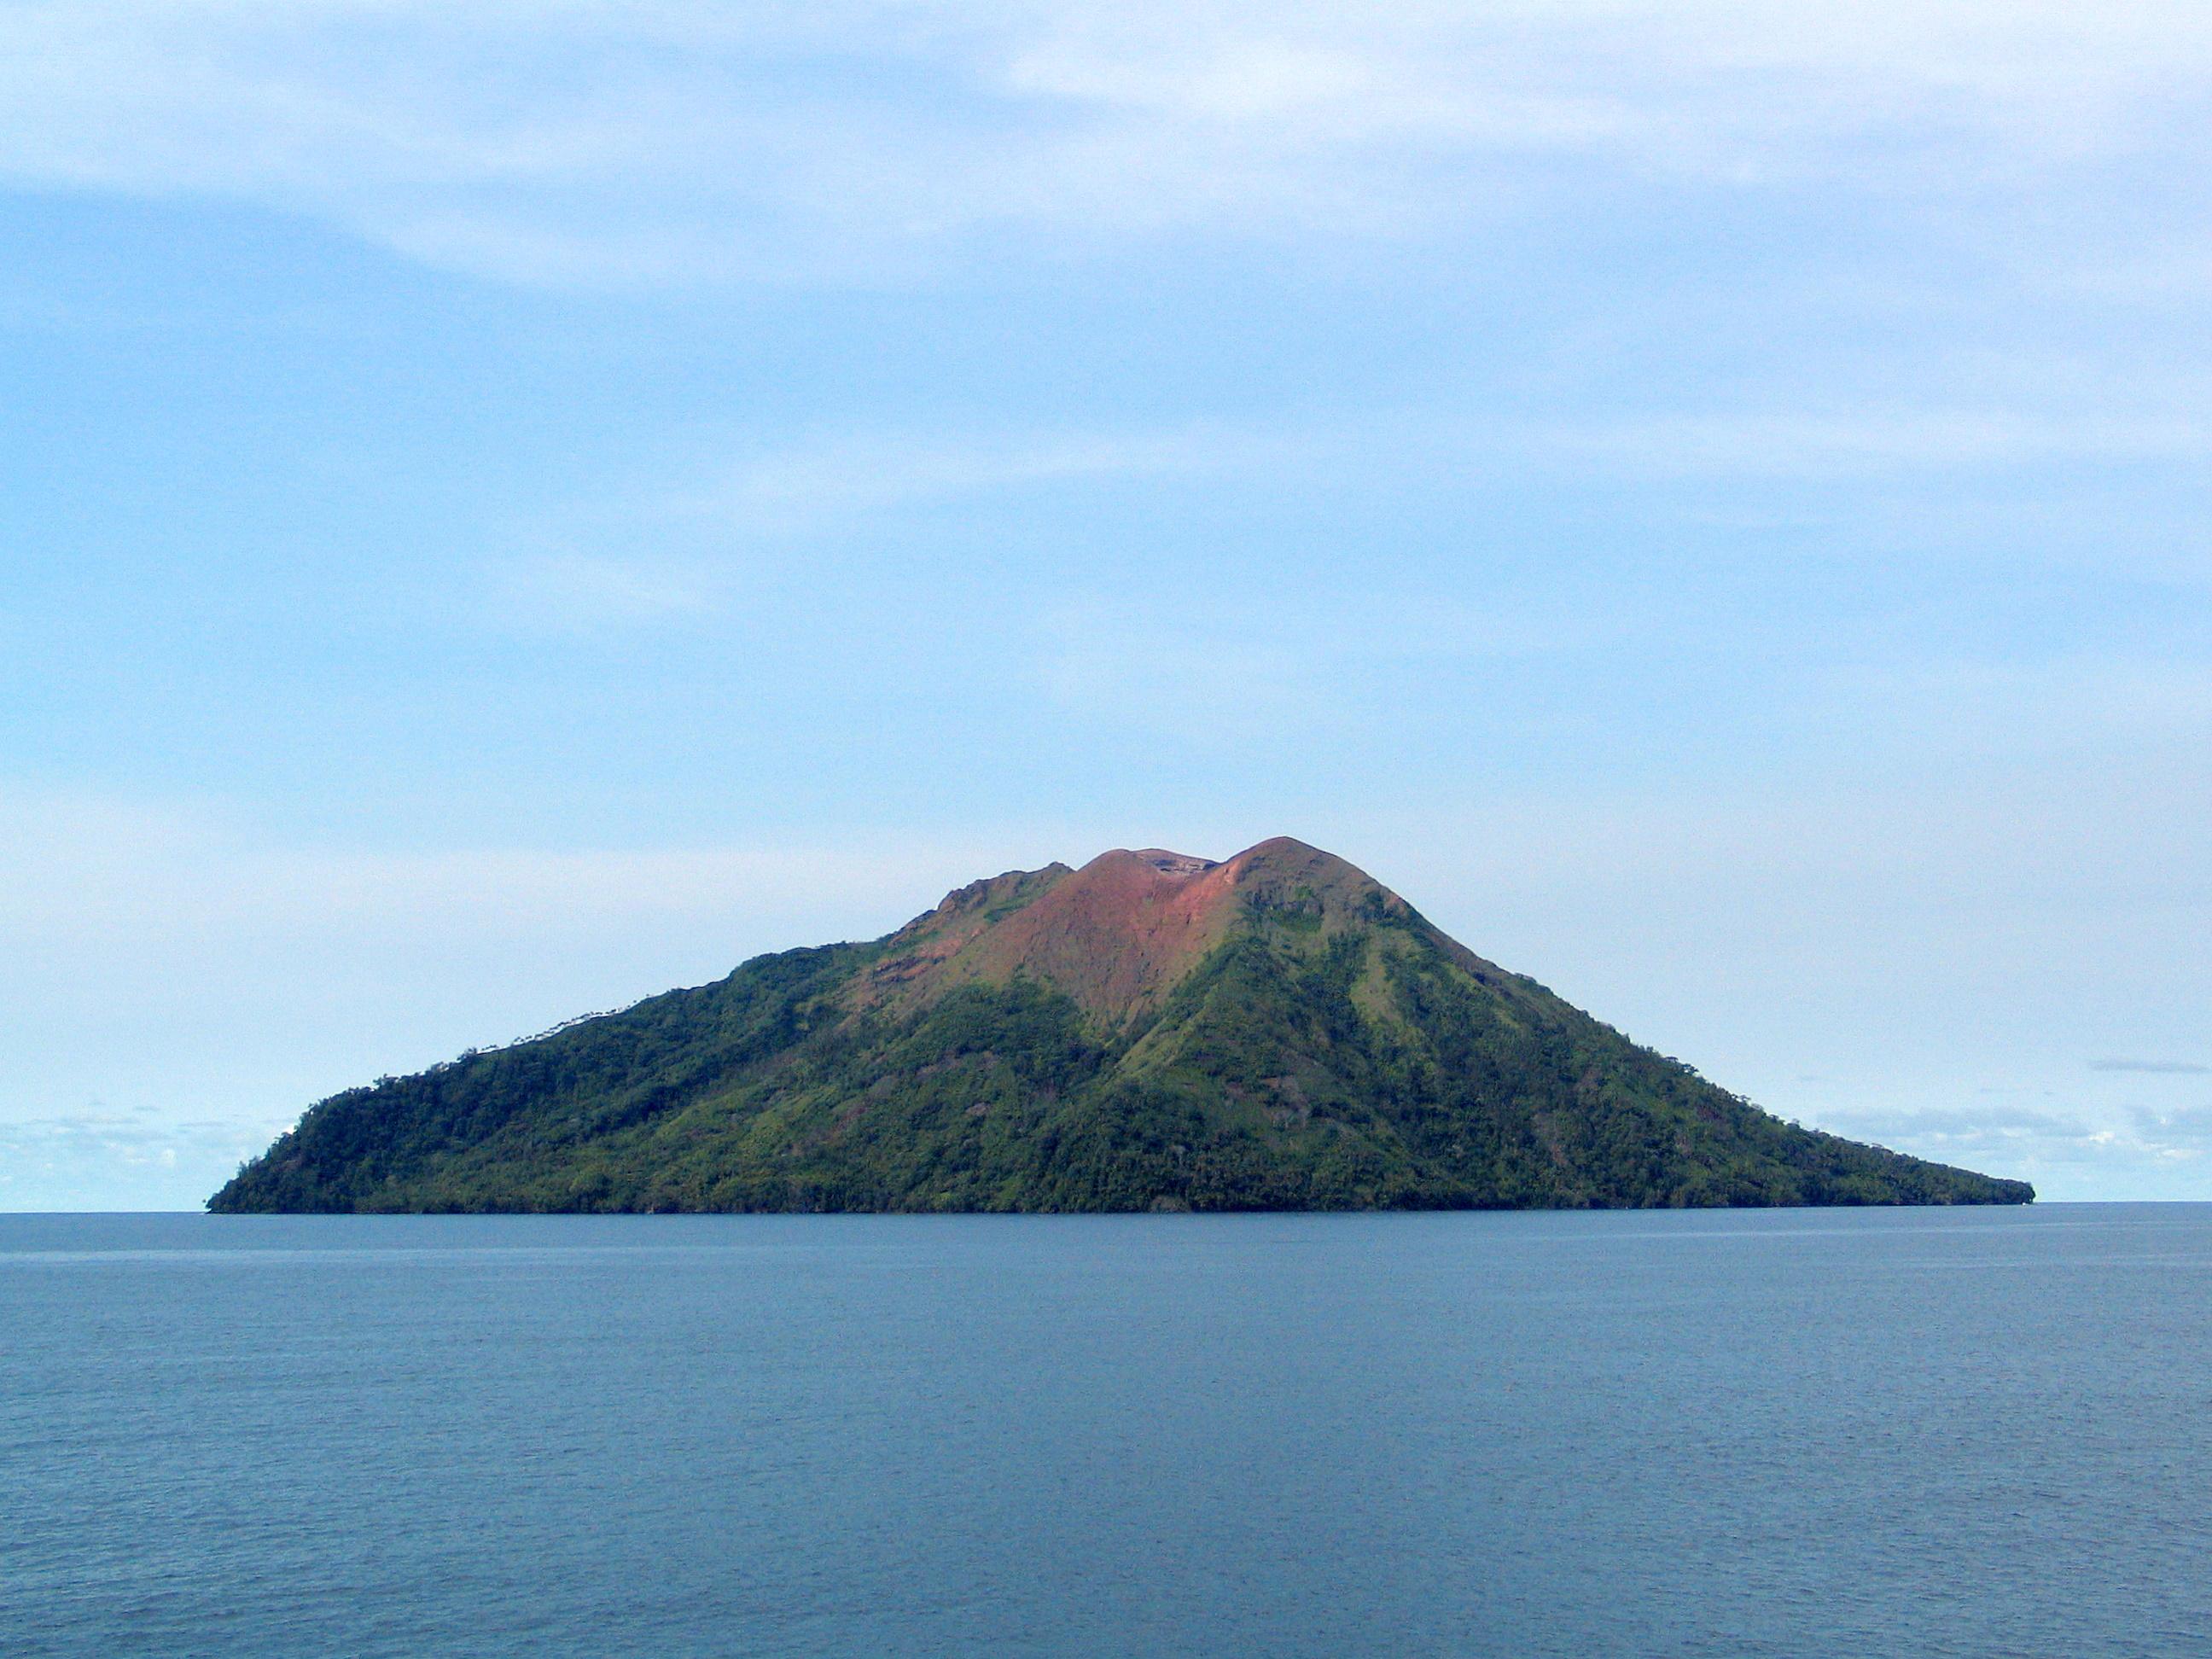 Hdpng - Island, Transparent background PNG HD thumbnail